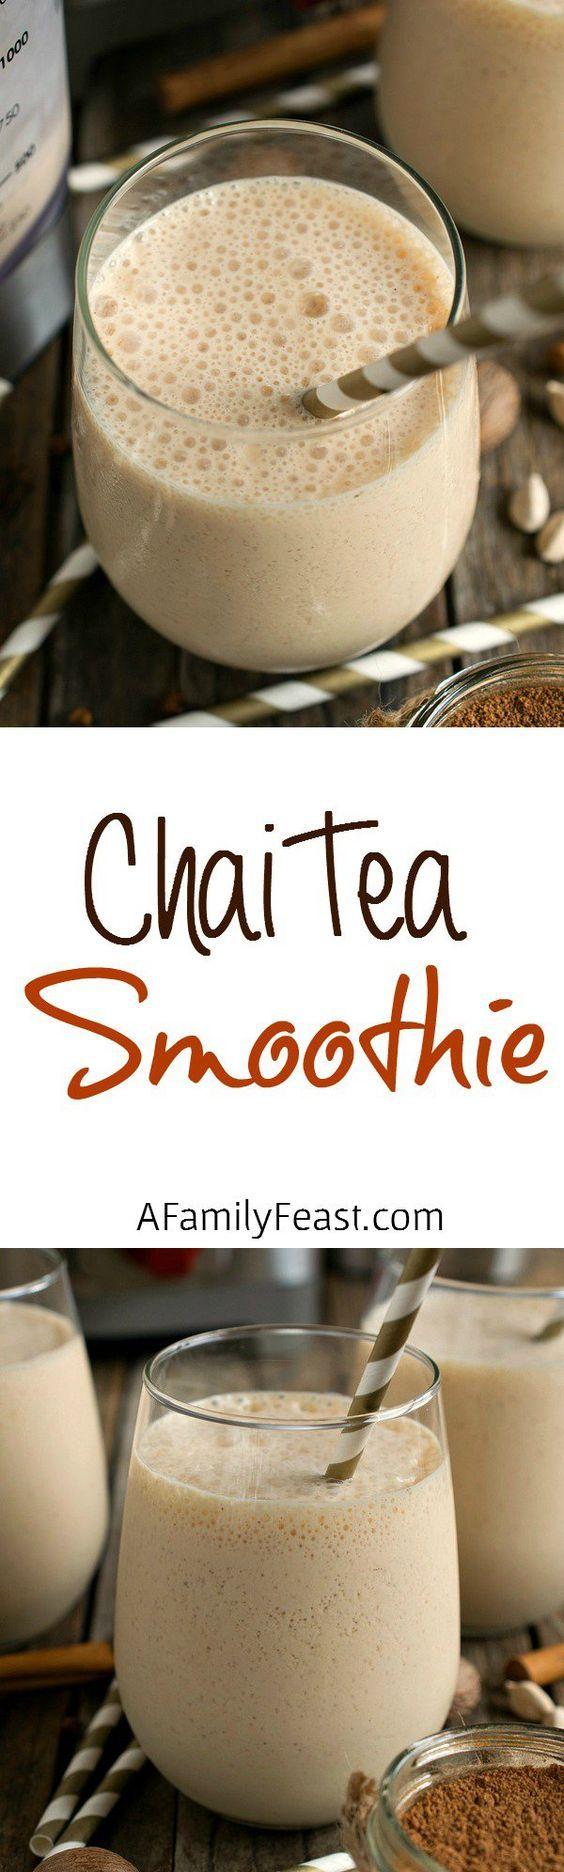 Chai Tea Smoothie - A Family Feast